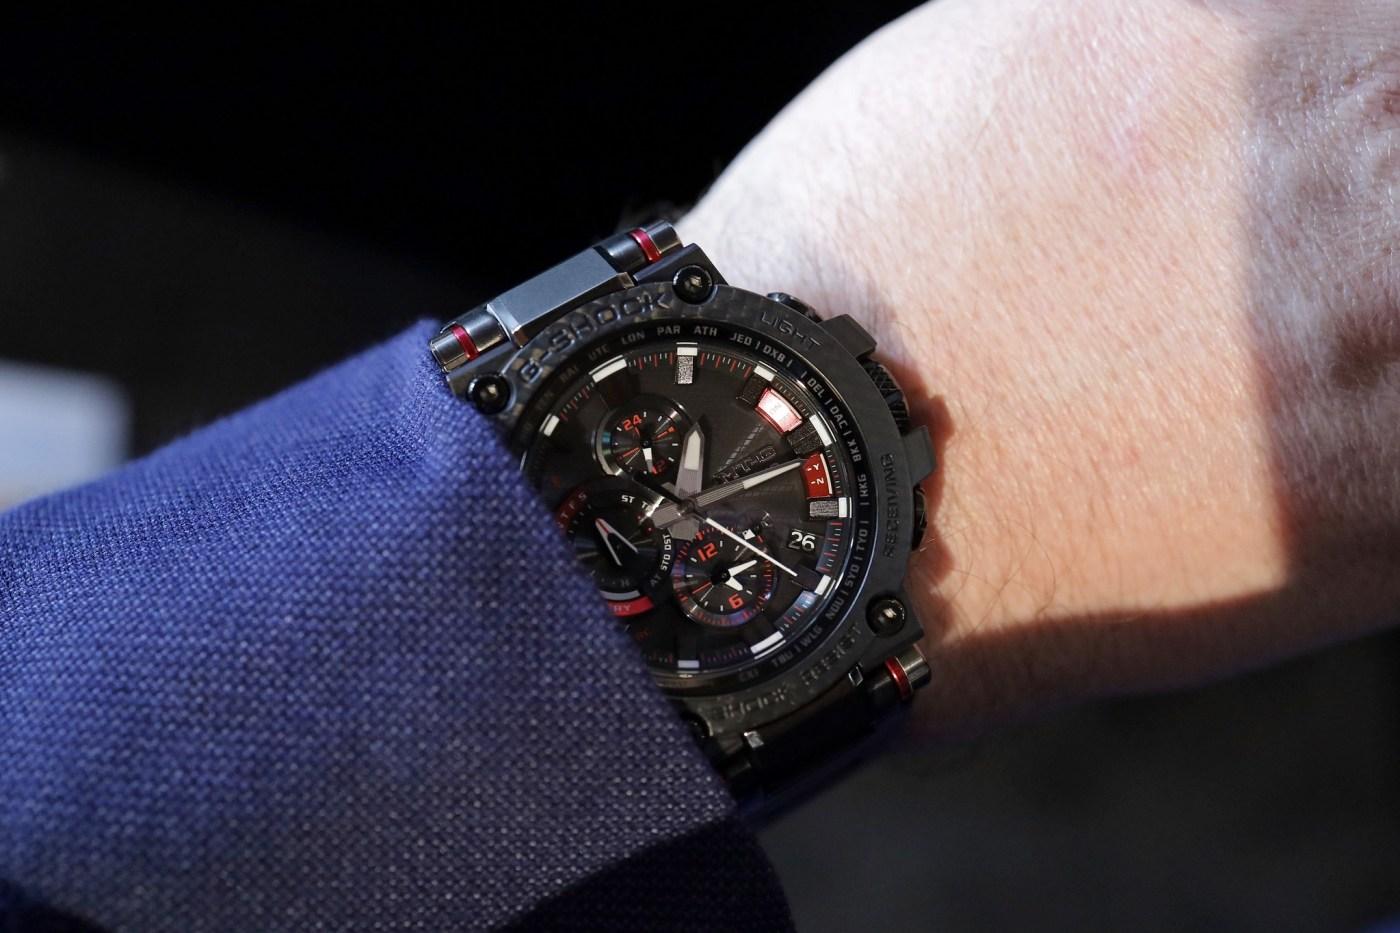 G-Shock MTG-B1000XBD-1A MT-G Carbon Bezel wristshot